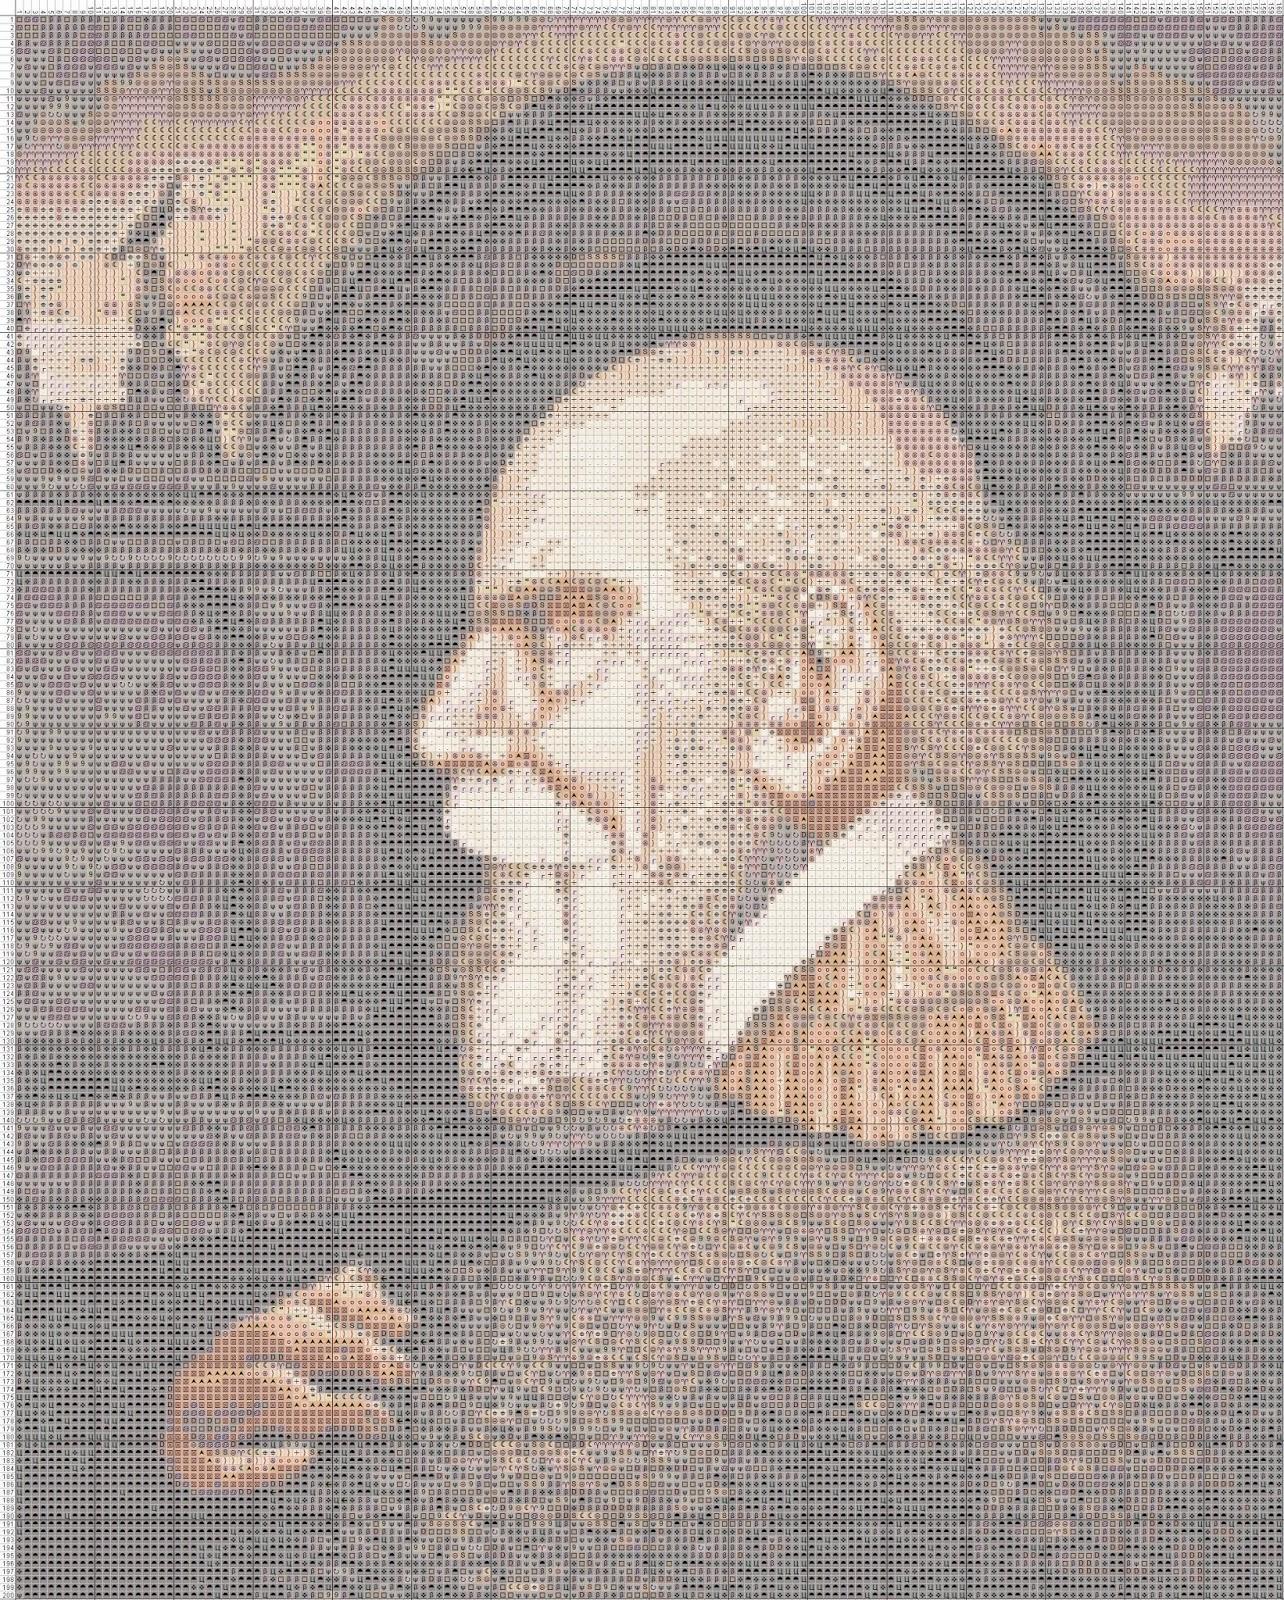 Gambar Pola Kristik - Ilusi Optik 3 - Wajah